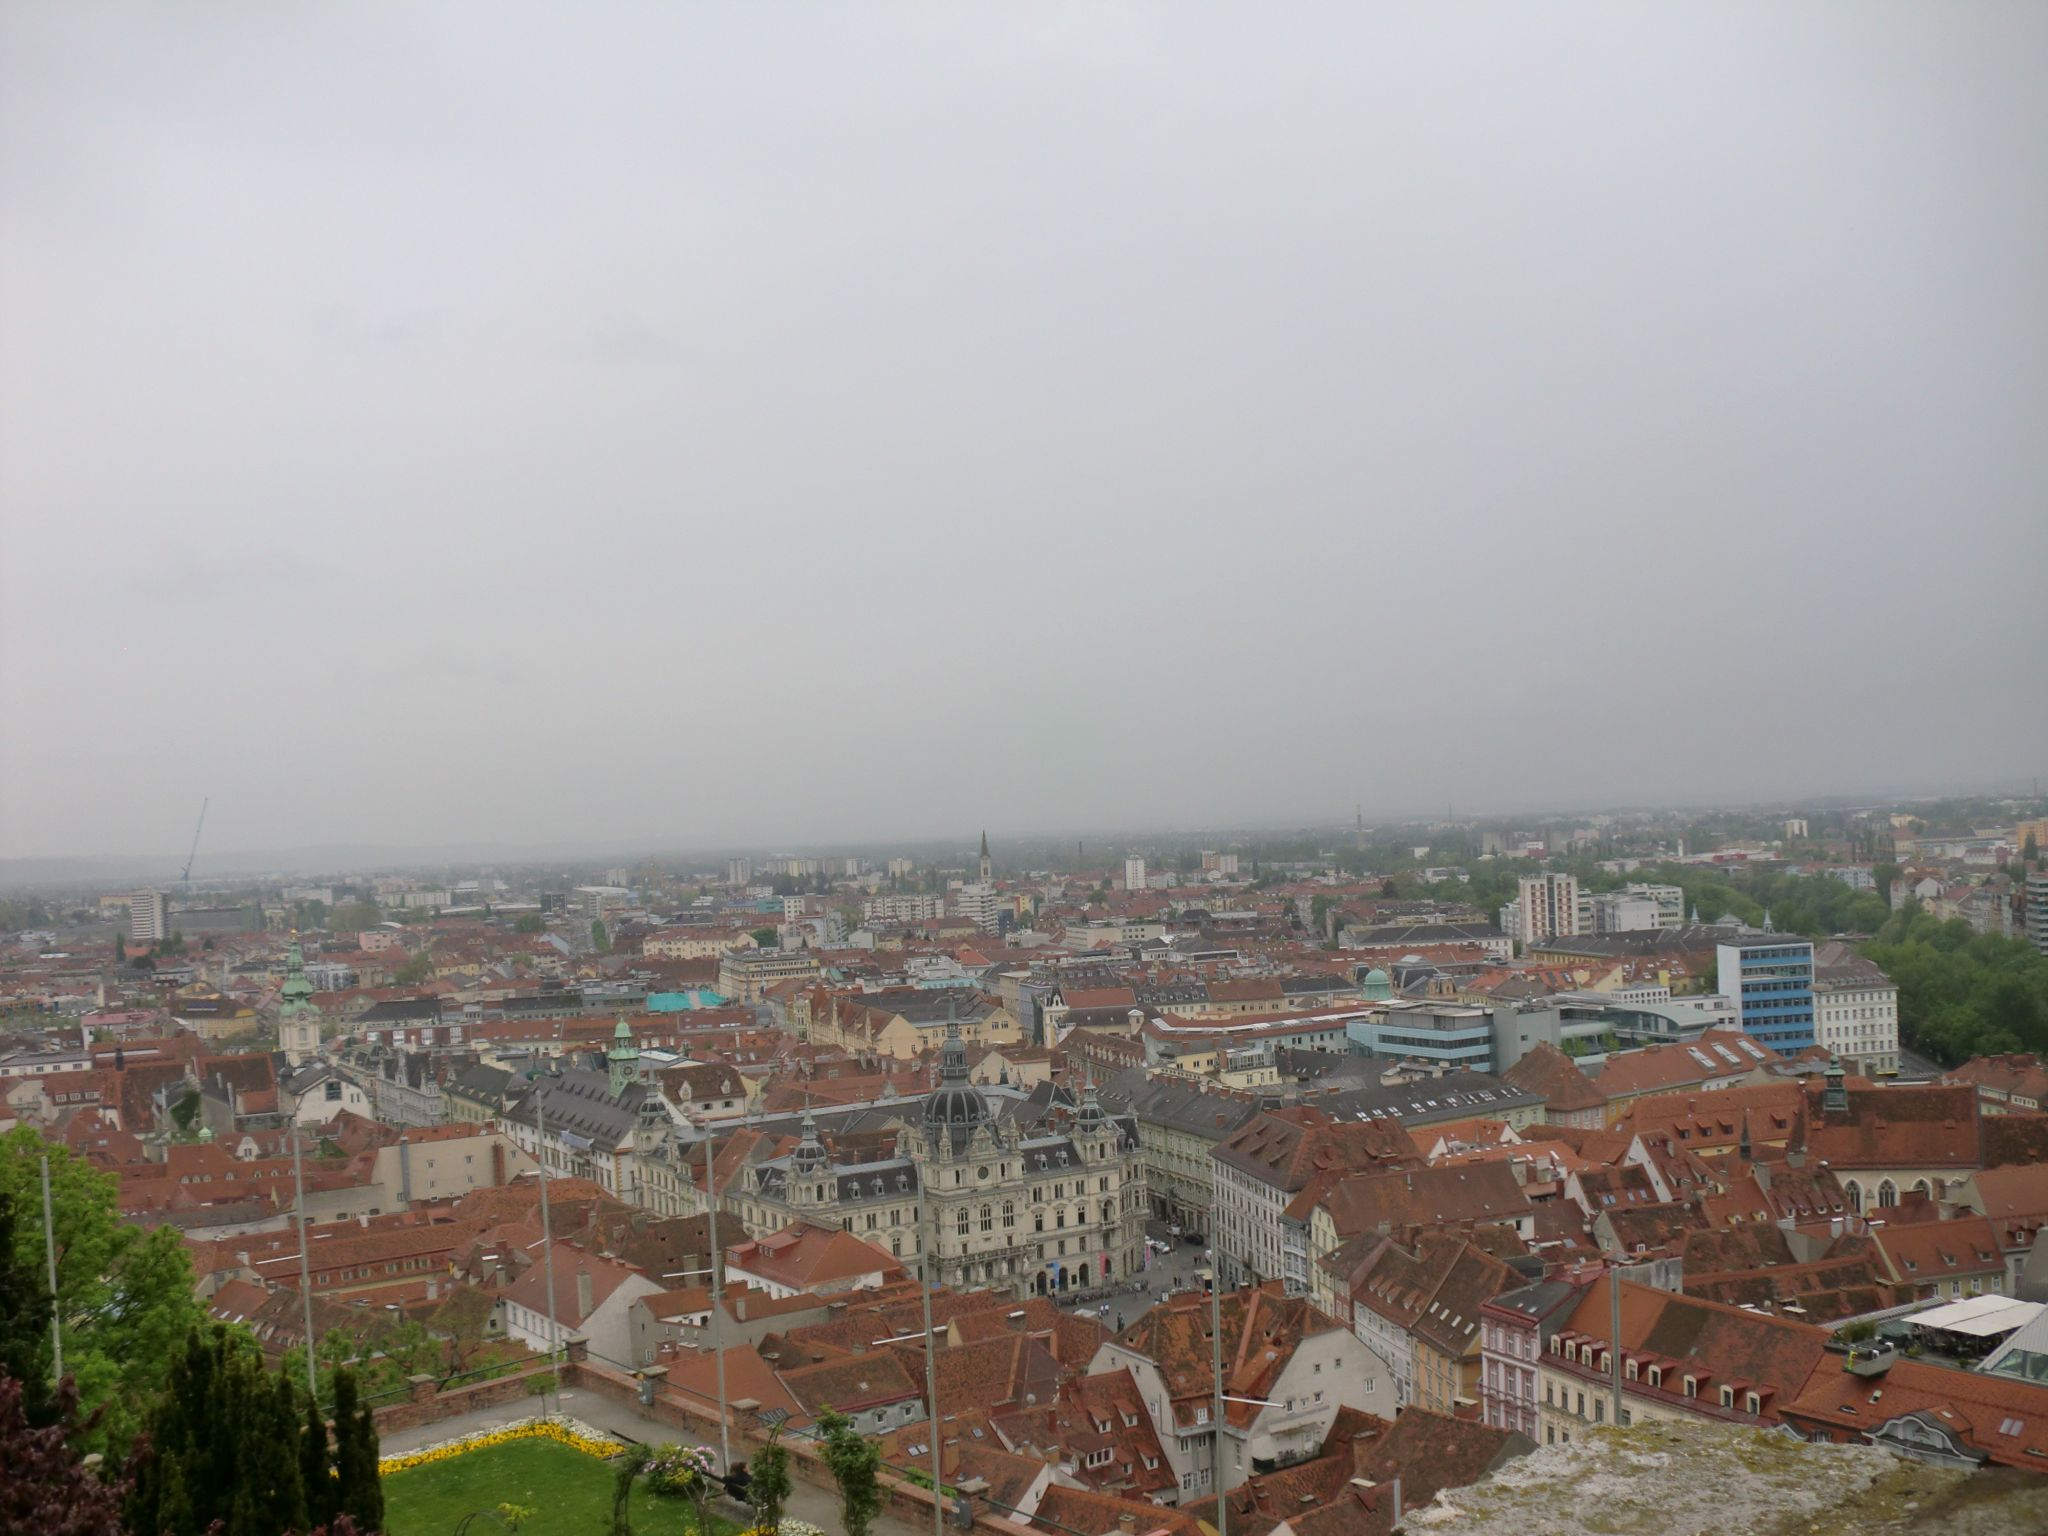 Graz view 11 - Graz: tradition and modernity